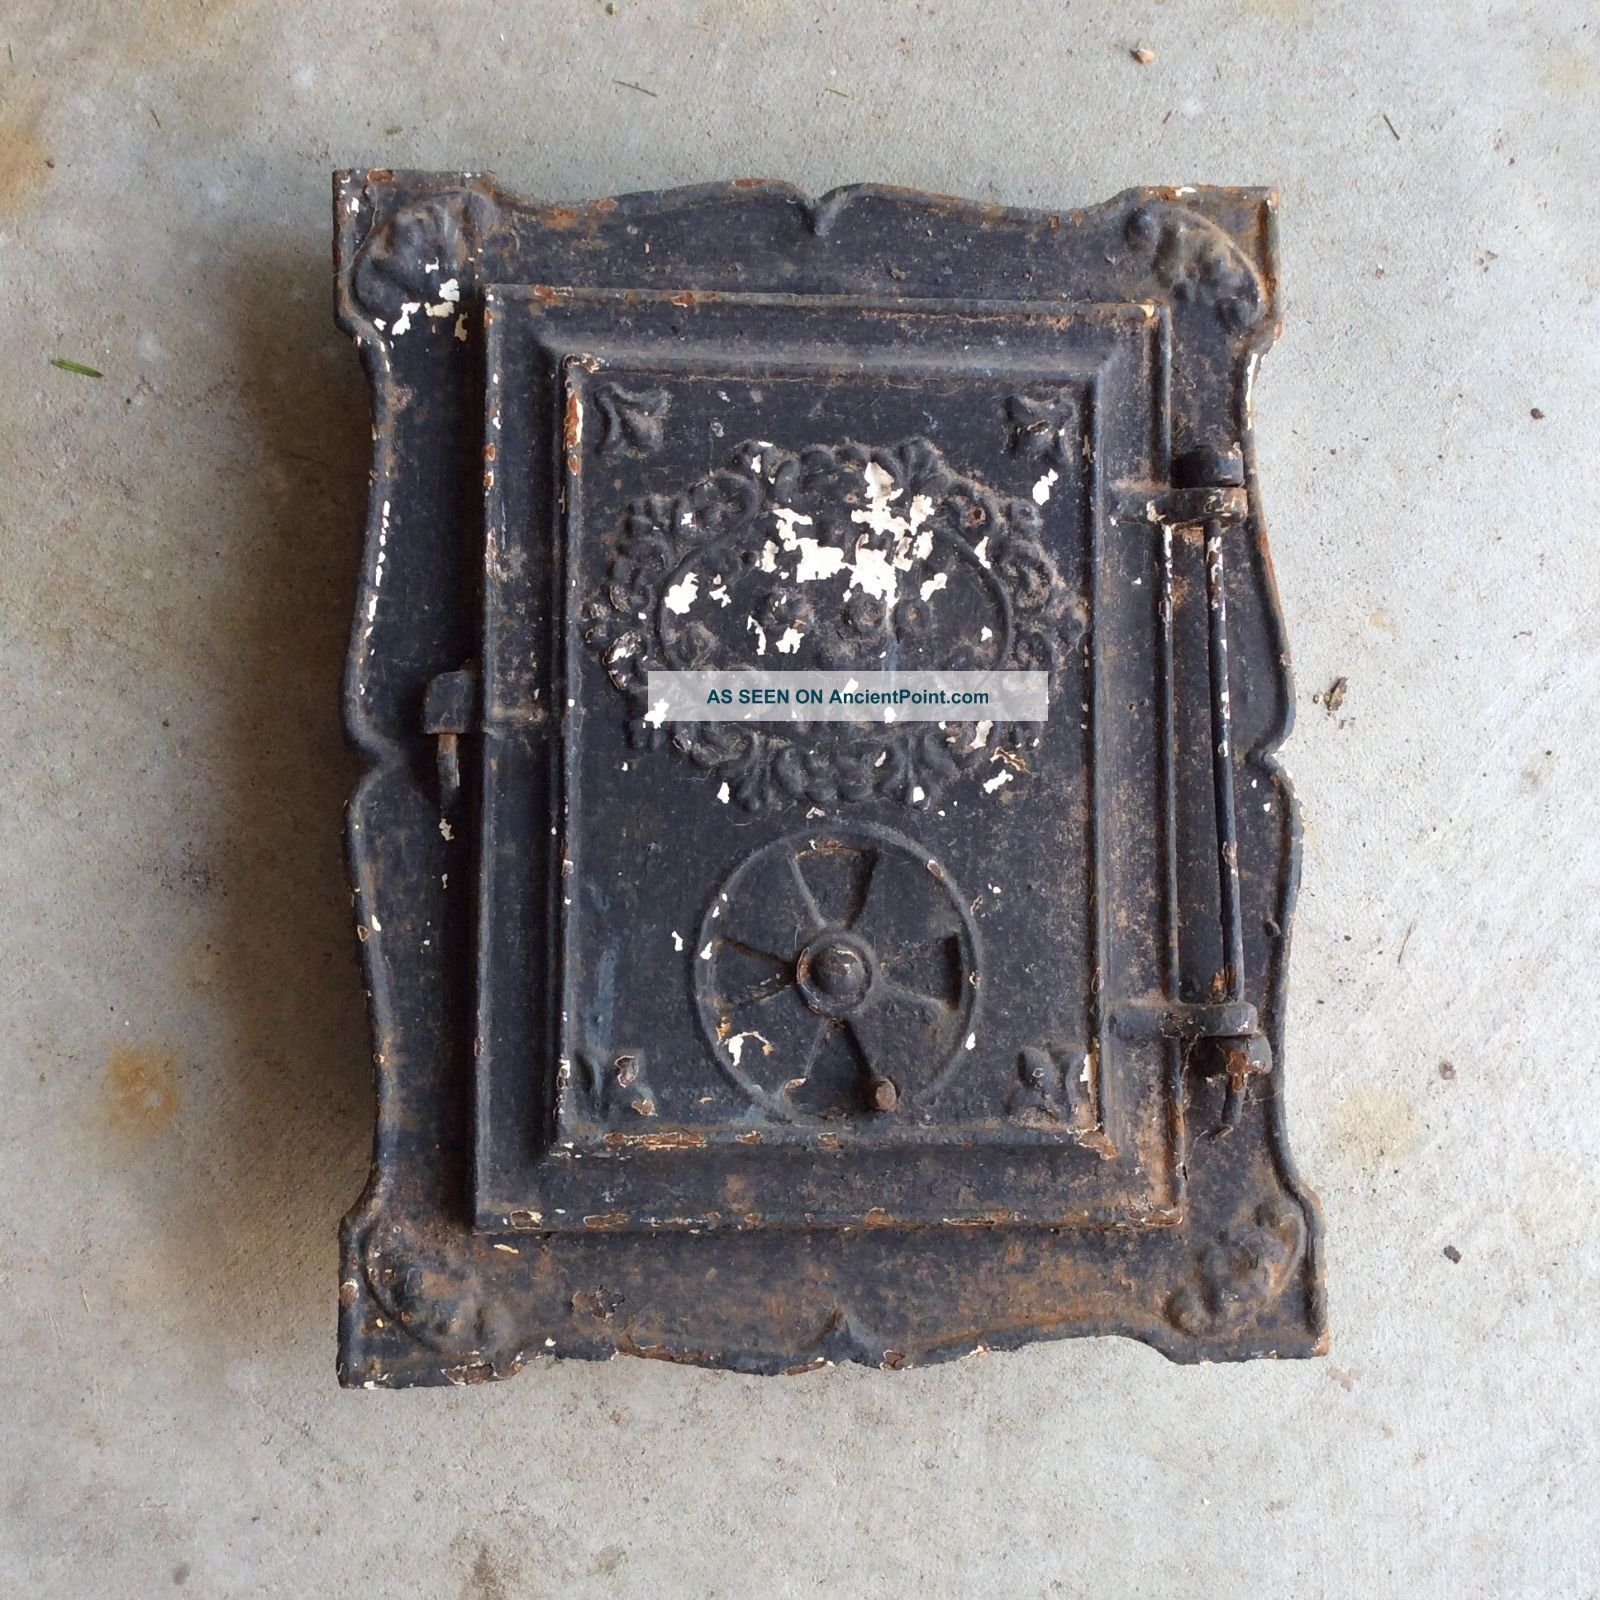 Antique Cast Iron Wood Stove Door Bee Hive Benjamin Ellis Carver Ma C1812 - 1856 Stoves photo